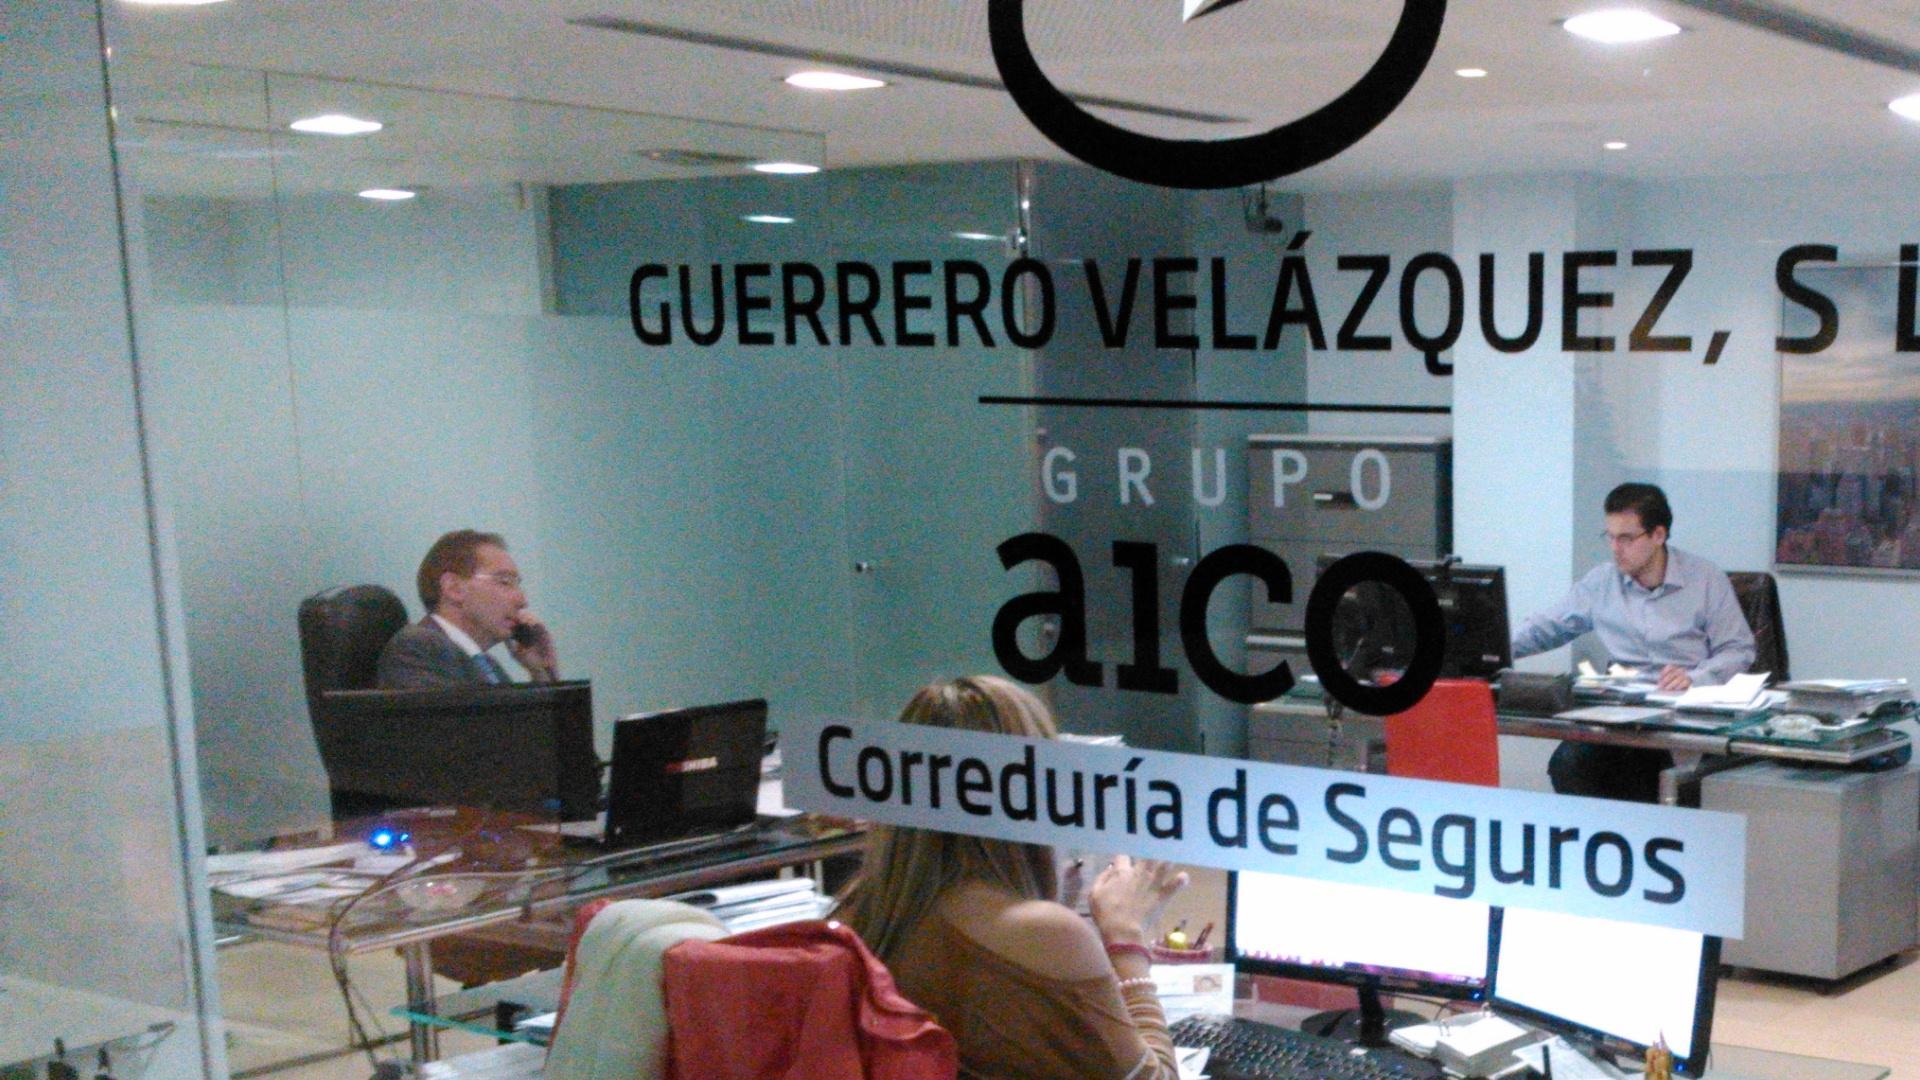 GUERRERO VELÁZQUEZ s.l. - Grupo AICO